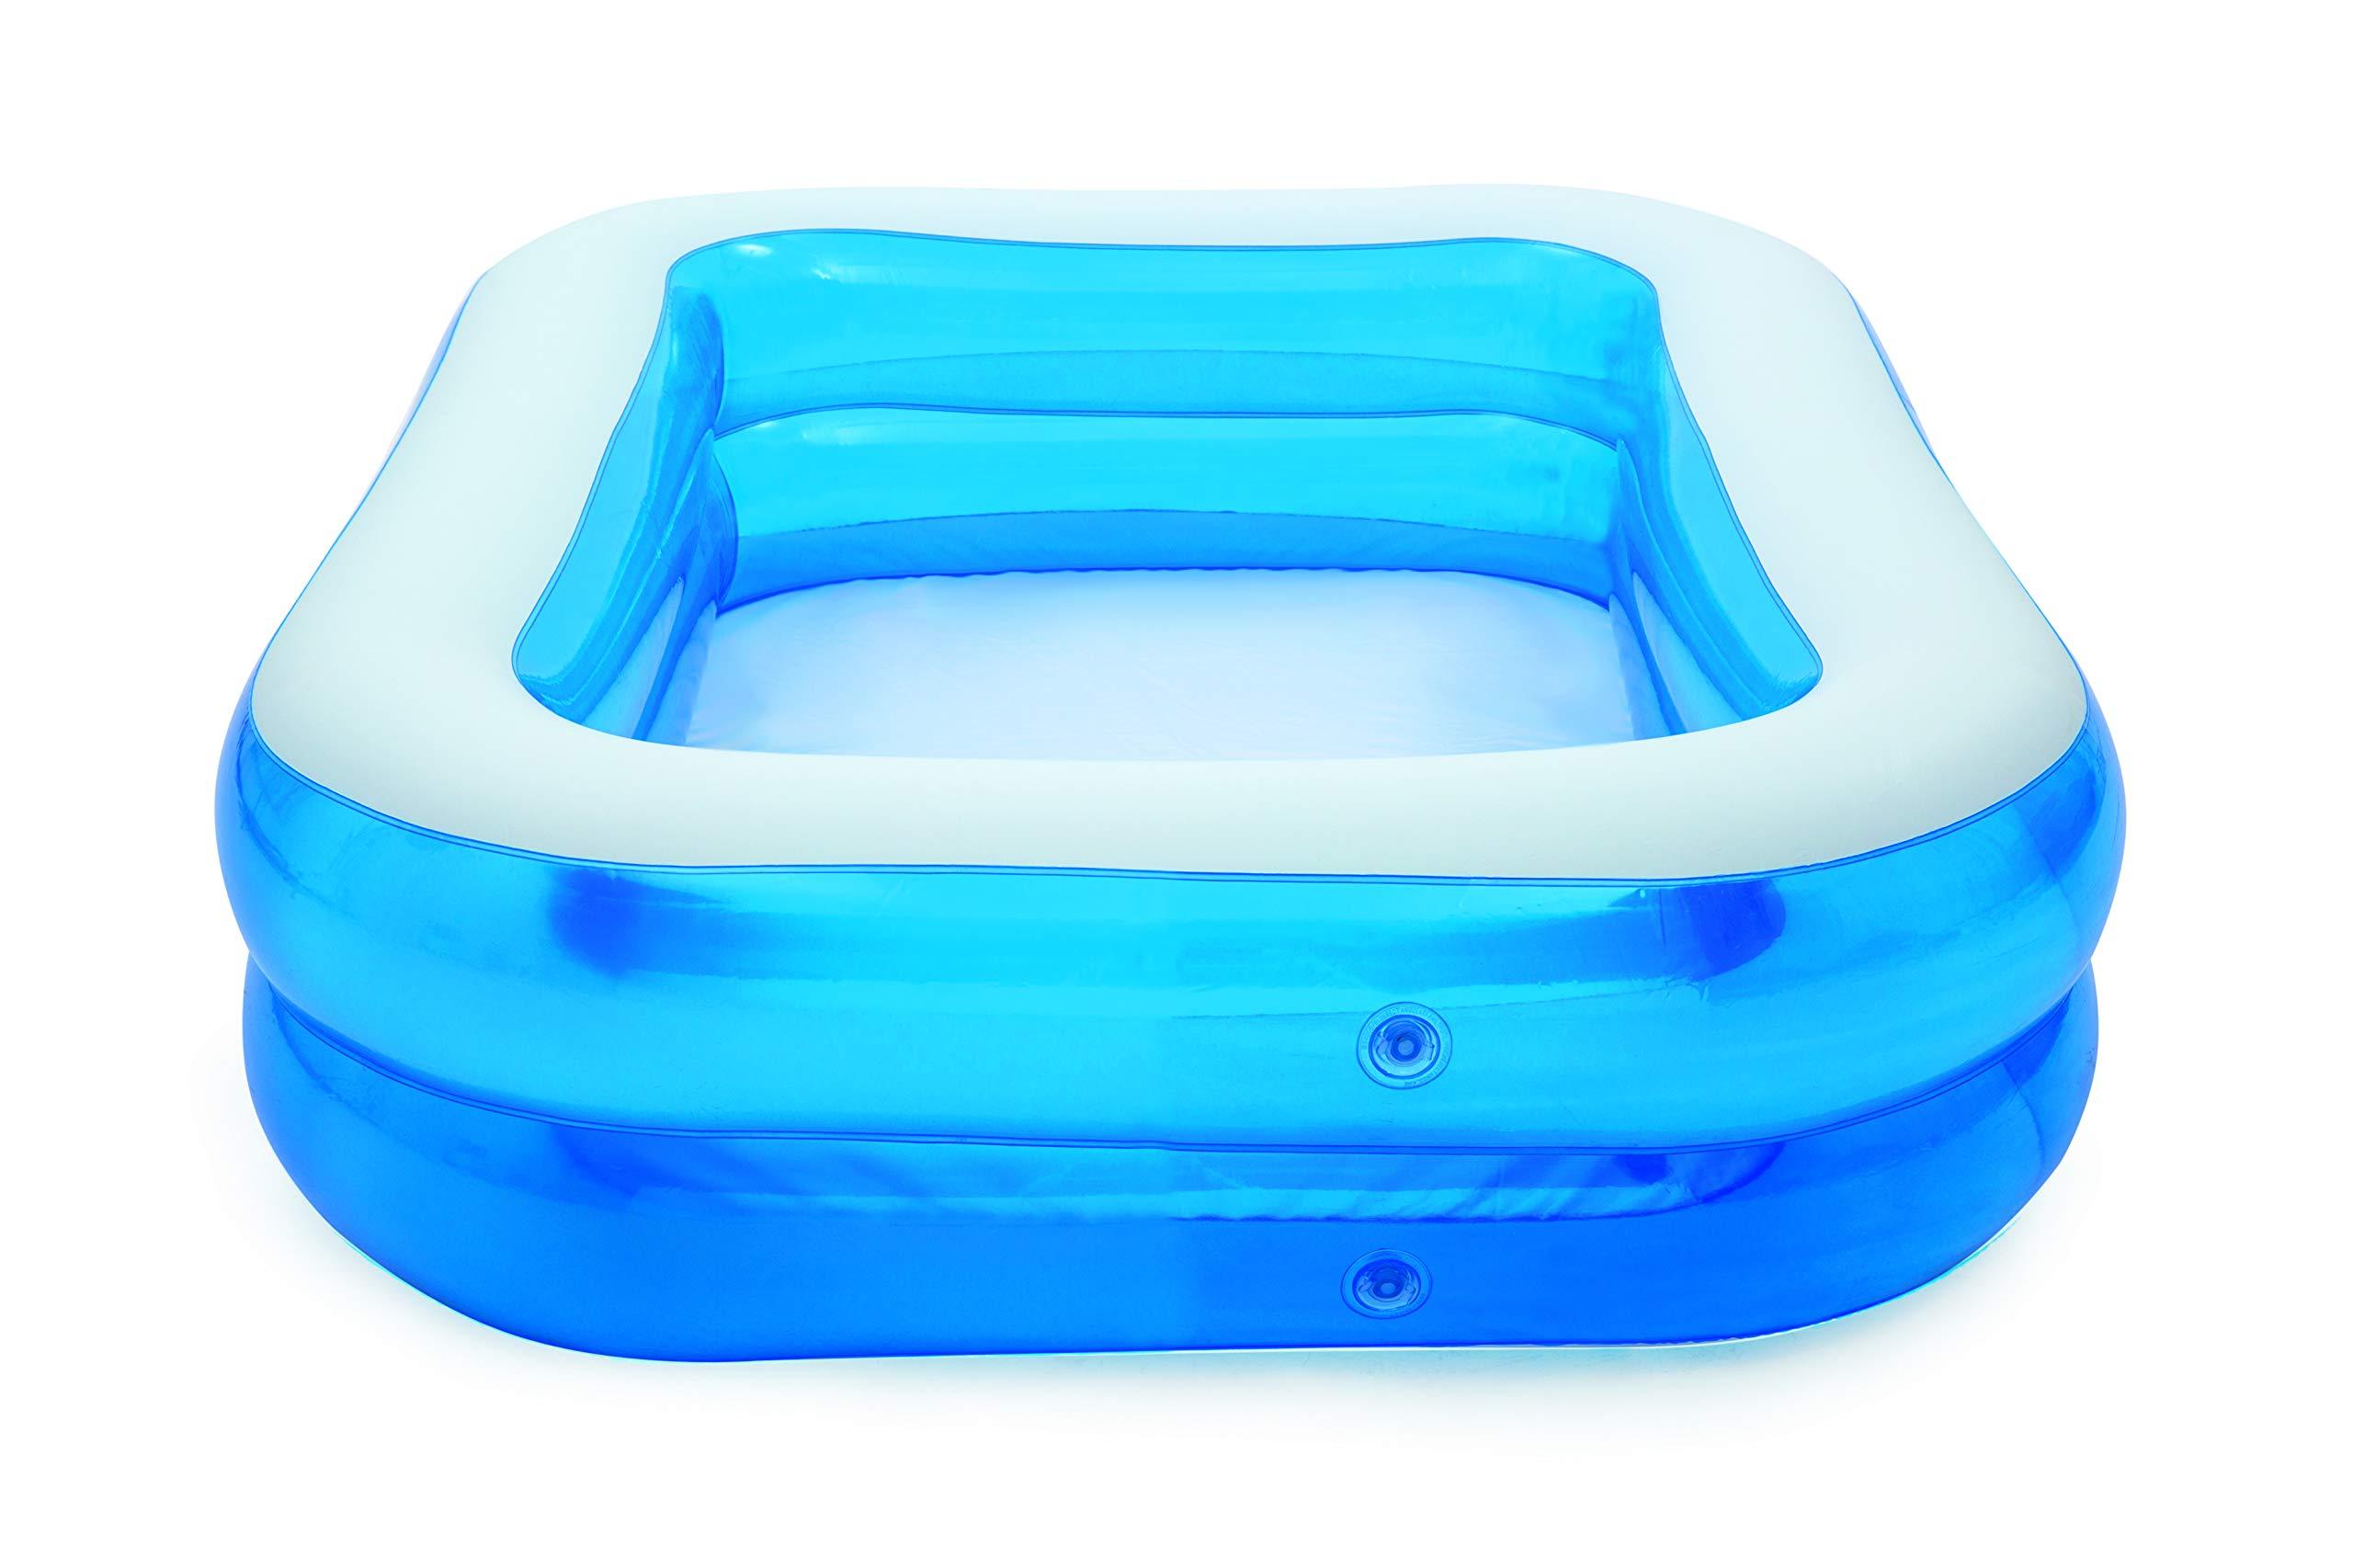 Bestway 54005 - Piscina Hinchable Infantil Blue Rectangular 201x150x51 cm: Bestway 79 x 59 x 20-inches Rectangular Family Pool: Amazon.es: Coche y moto